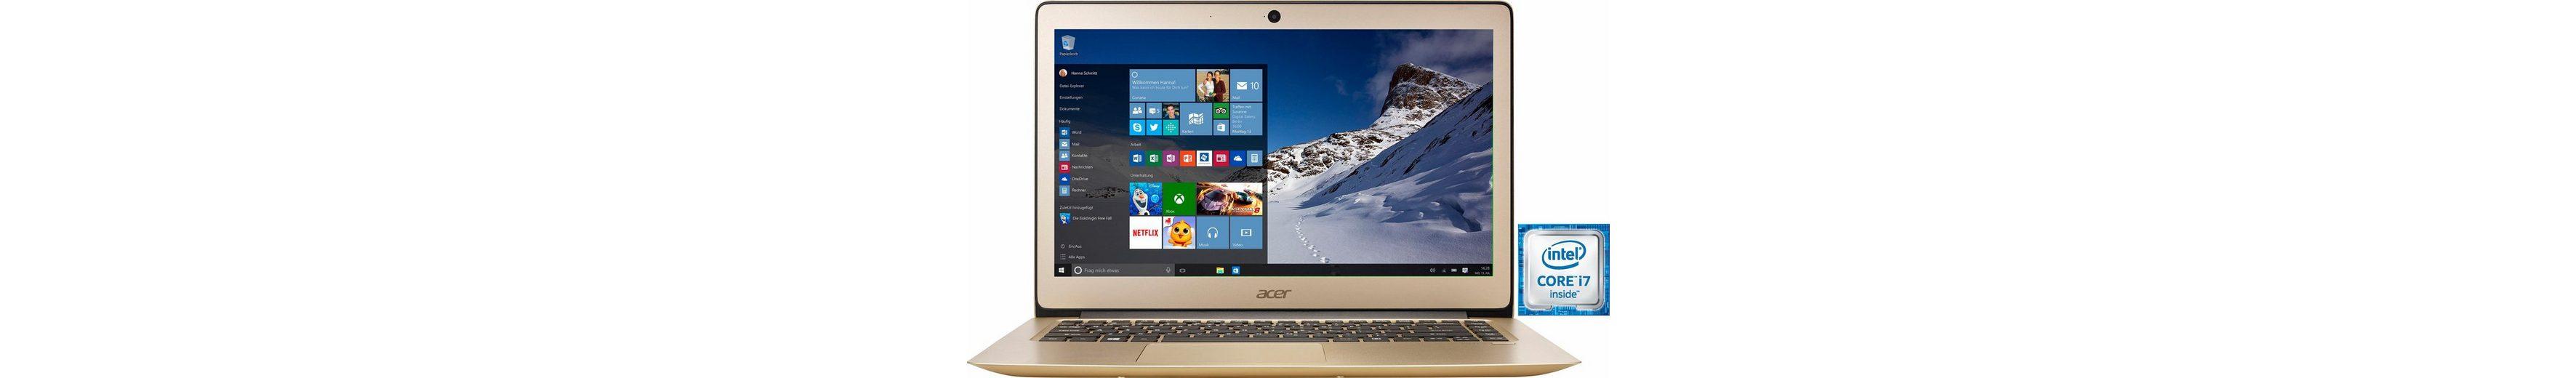 Acer Swift SF314-51-74X2 Notebook, Intel® Core™ i7, 35,6 cm (14 Zoll), 512 GB Speicher